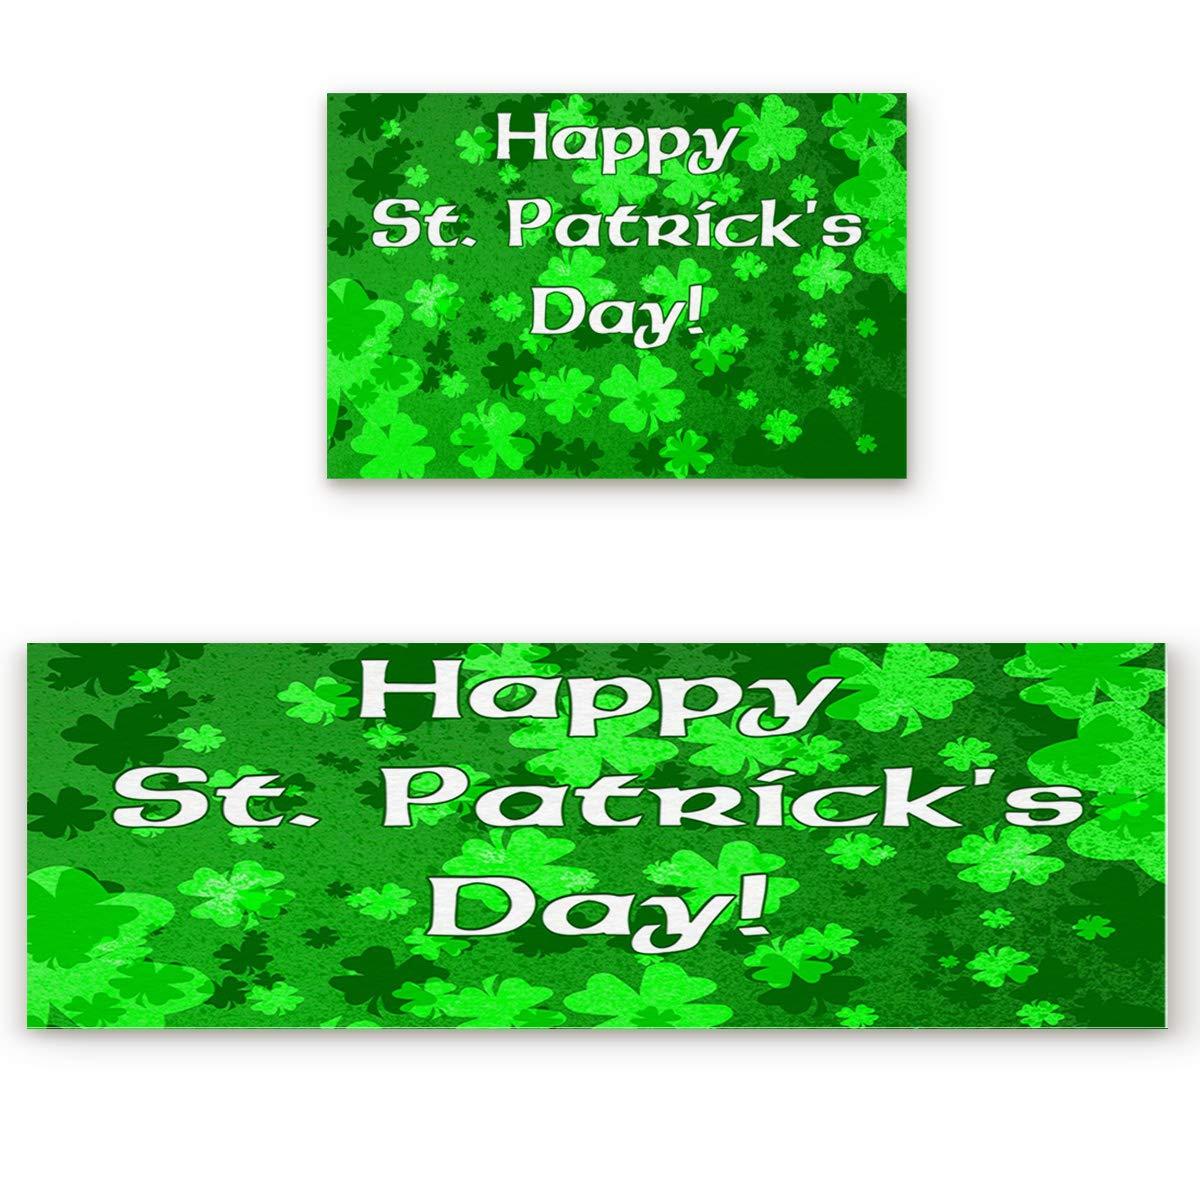 St. Patrick's Day1san0063 19.7 x31.5 +19.7 x63  Savannan 2 Piece Non-Slip Kitchen Bathroom Entrance Mat Absorbent Durable Floor Doormat Runner Rug Set - Starry Sky